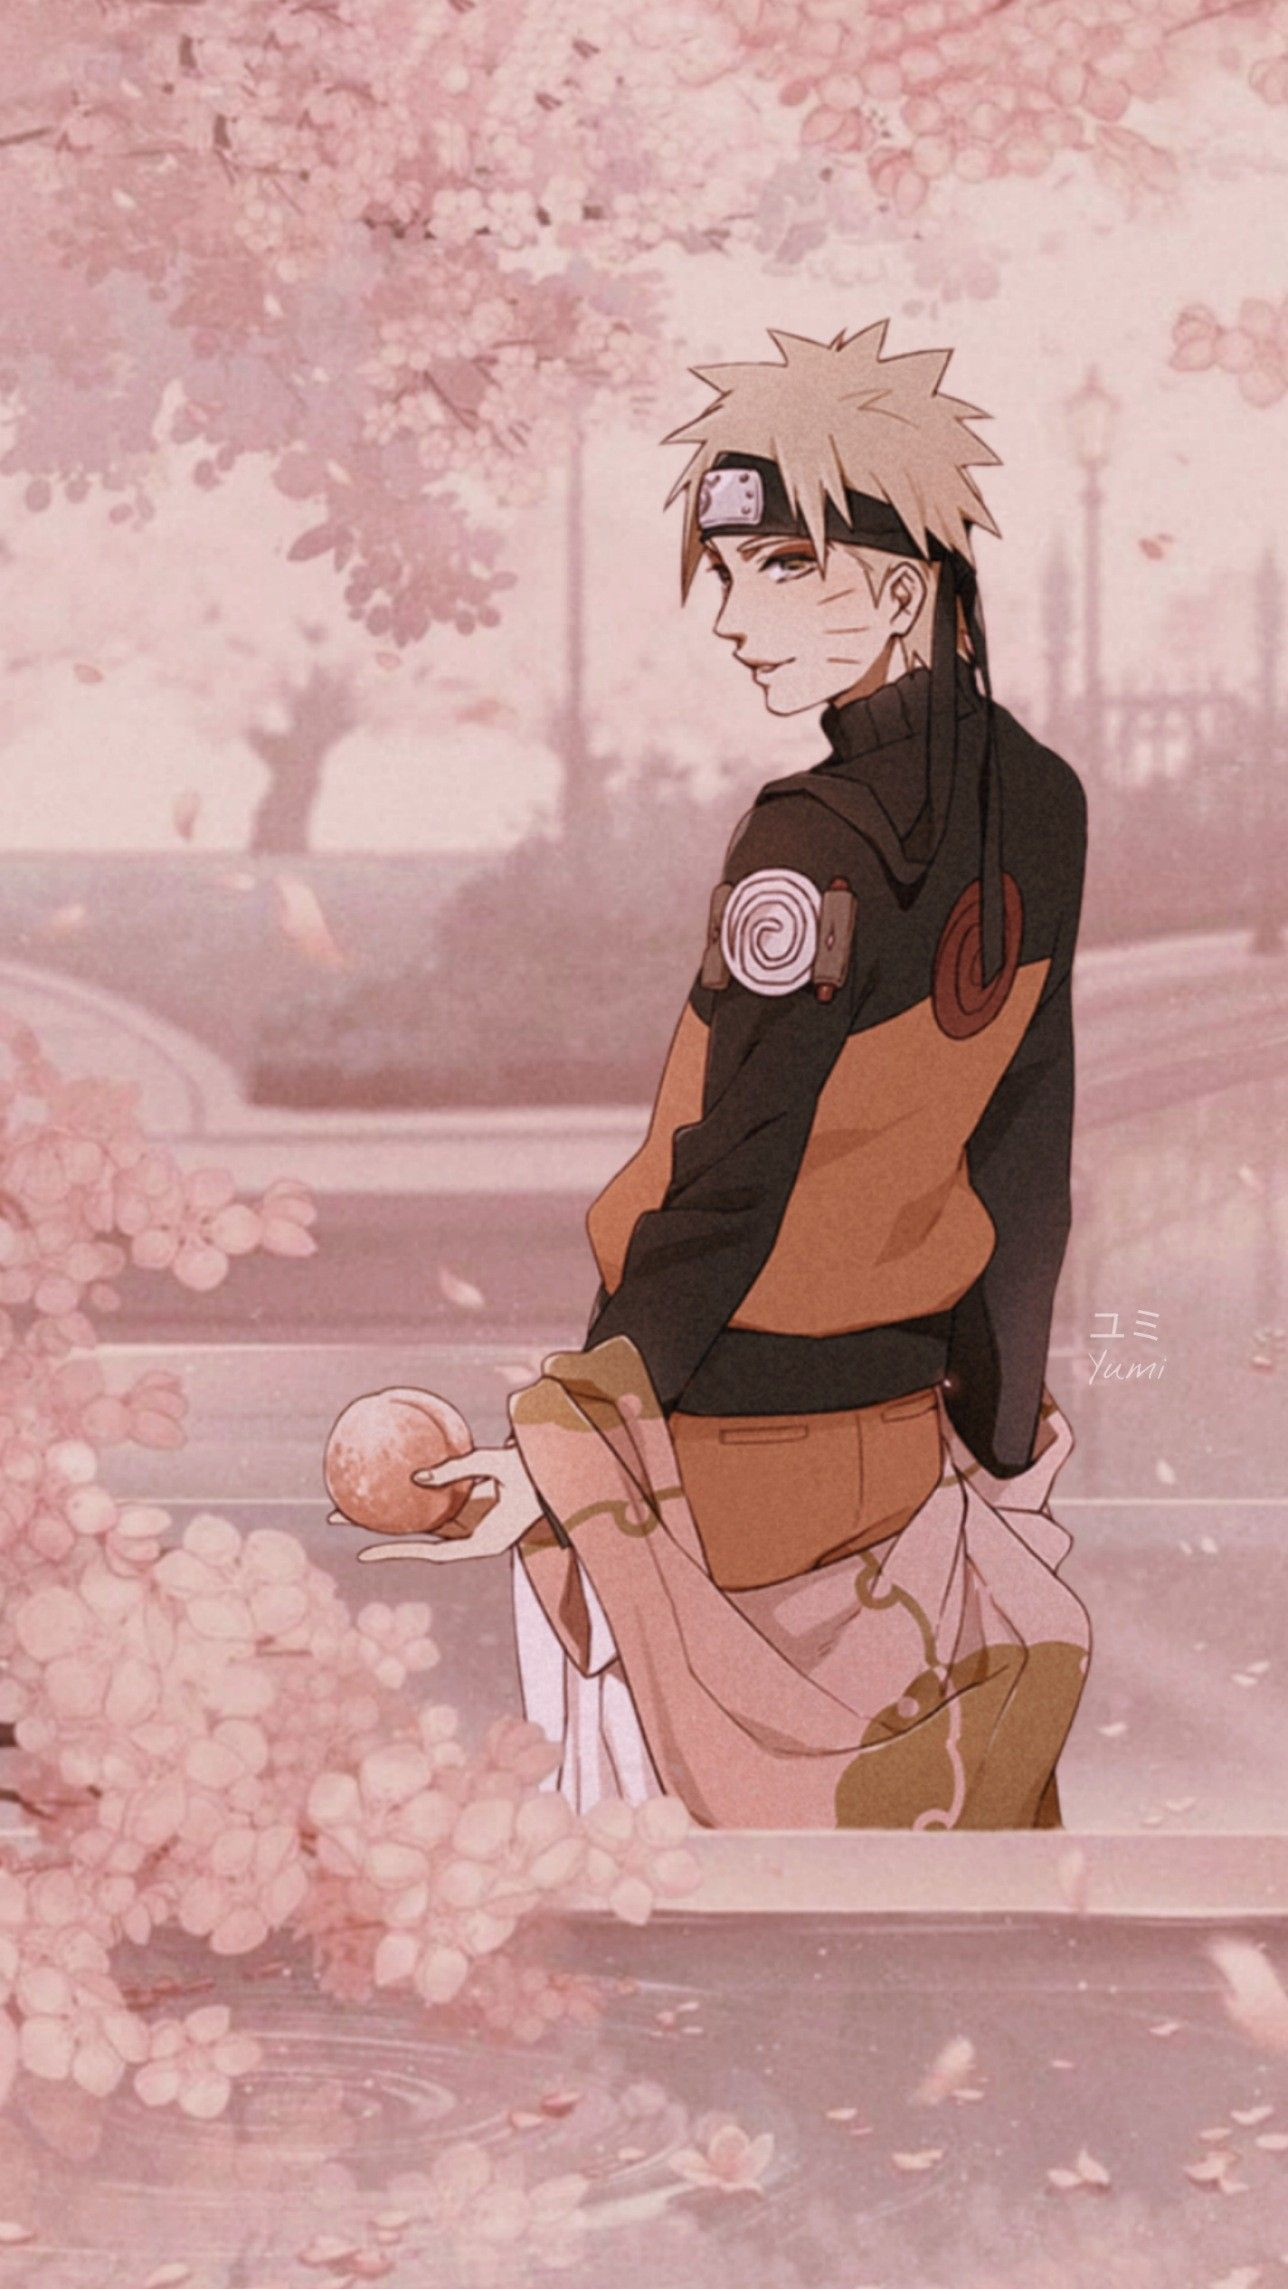 Aesthetic Anime Wallpapers Naruto